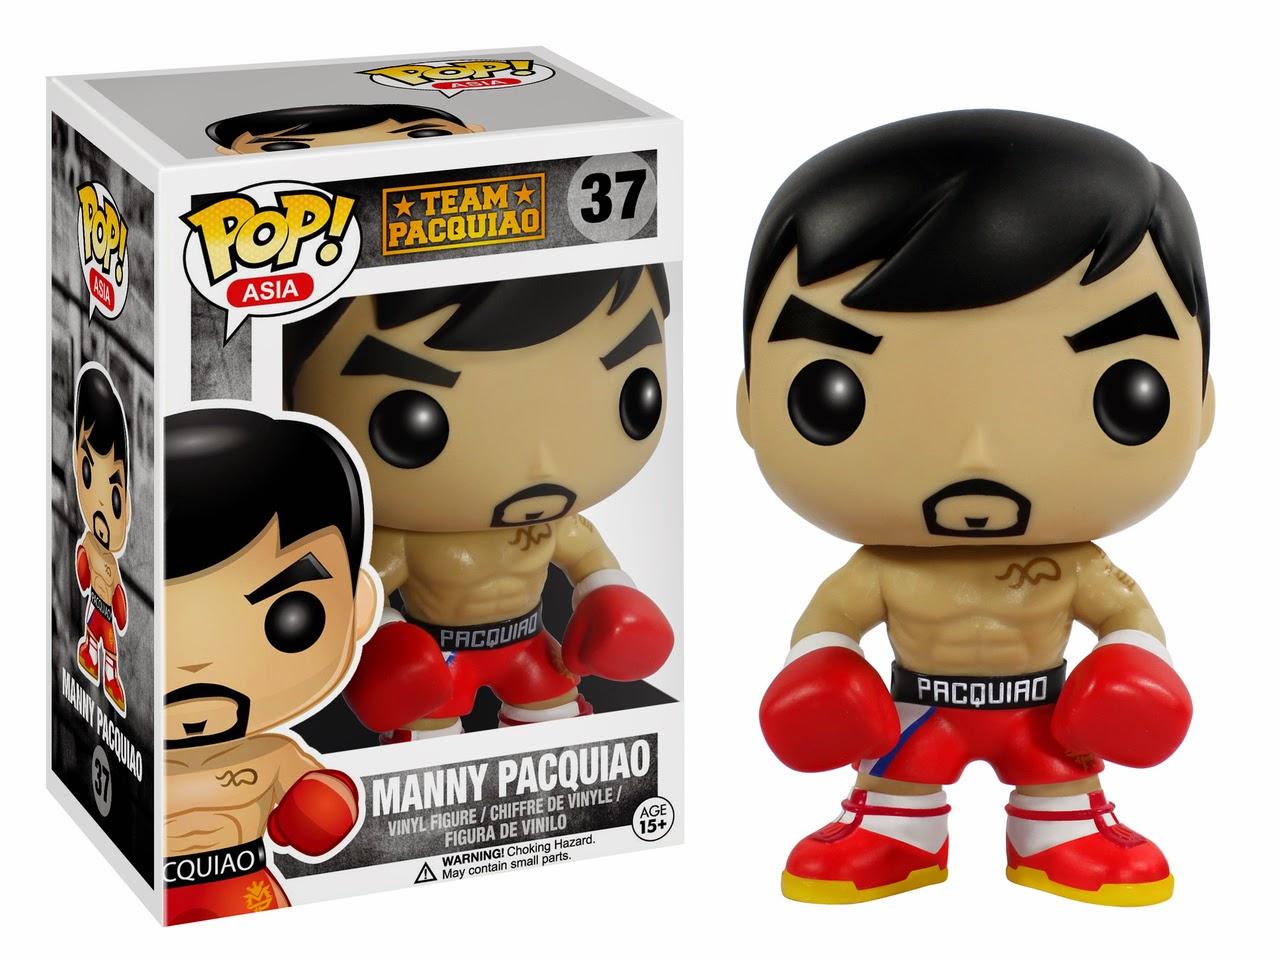 Manny Pacquiao Funko POP! Vinyl Figure glam shot